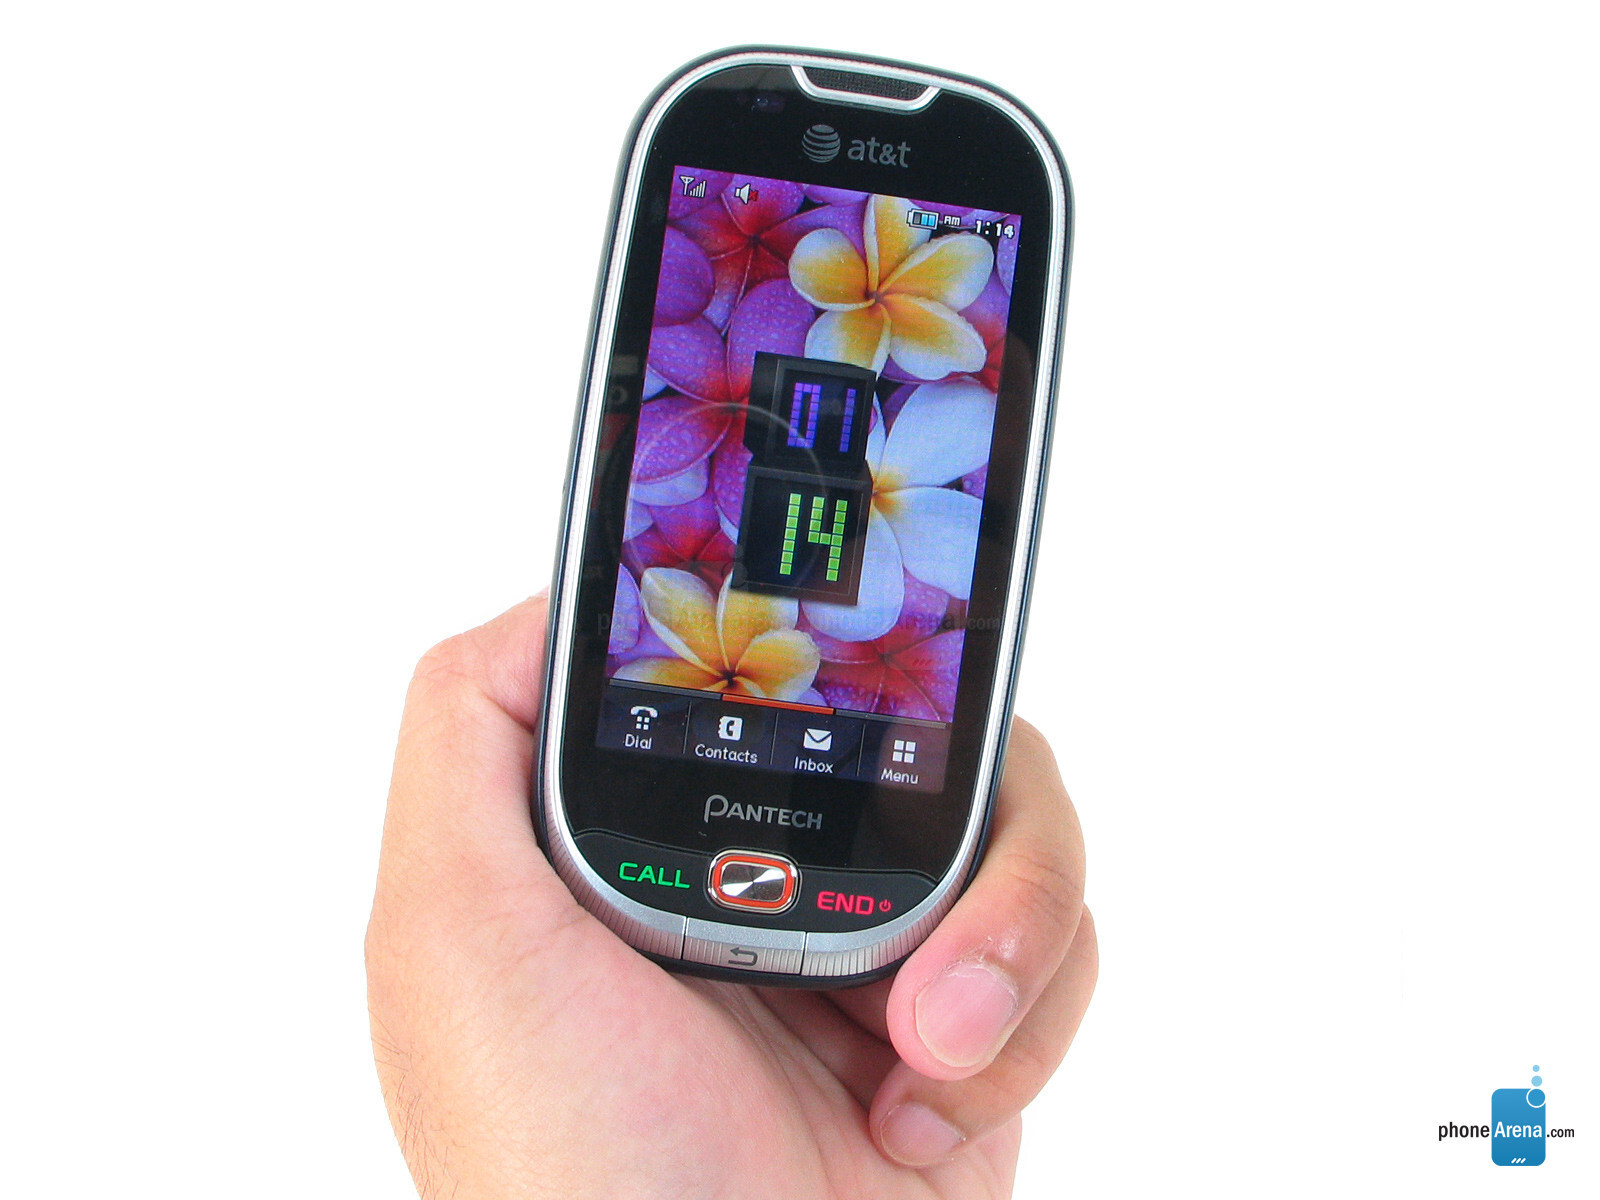 http://r3.whistleout.com.au/public/images/articles/2015/11/best-iphone-5s-banner.jpg